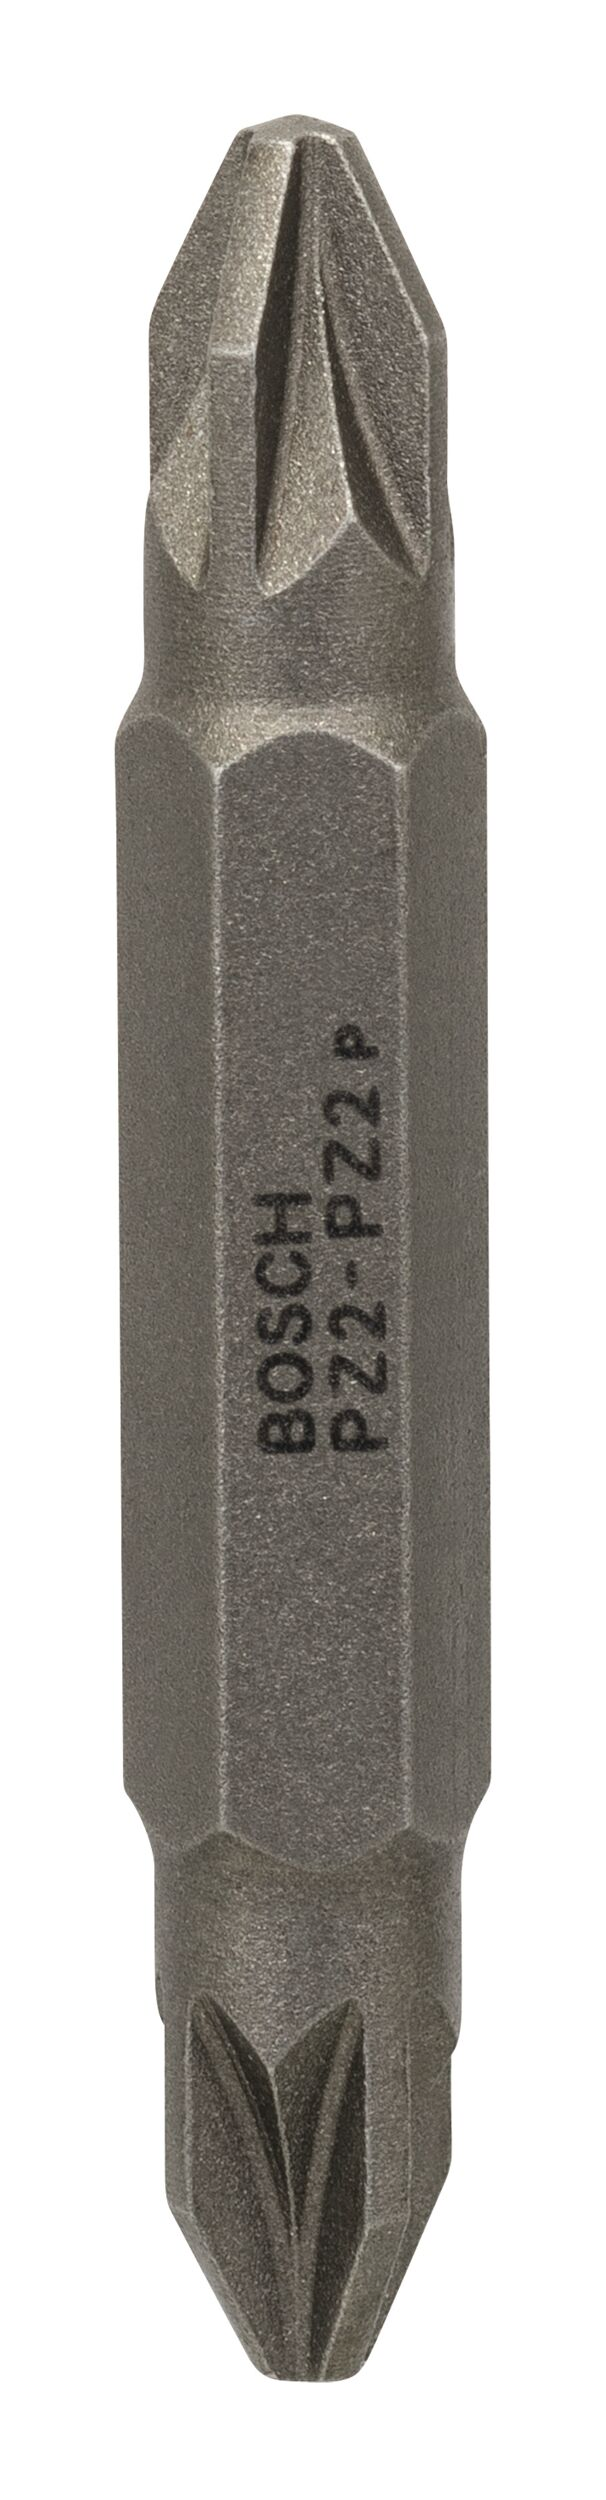 Bosch Zubehör Doppelklingenbit PZ2, PZ2, 45 mm - 2607001742 (VPE: 10 Stück)